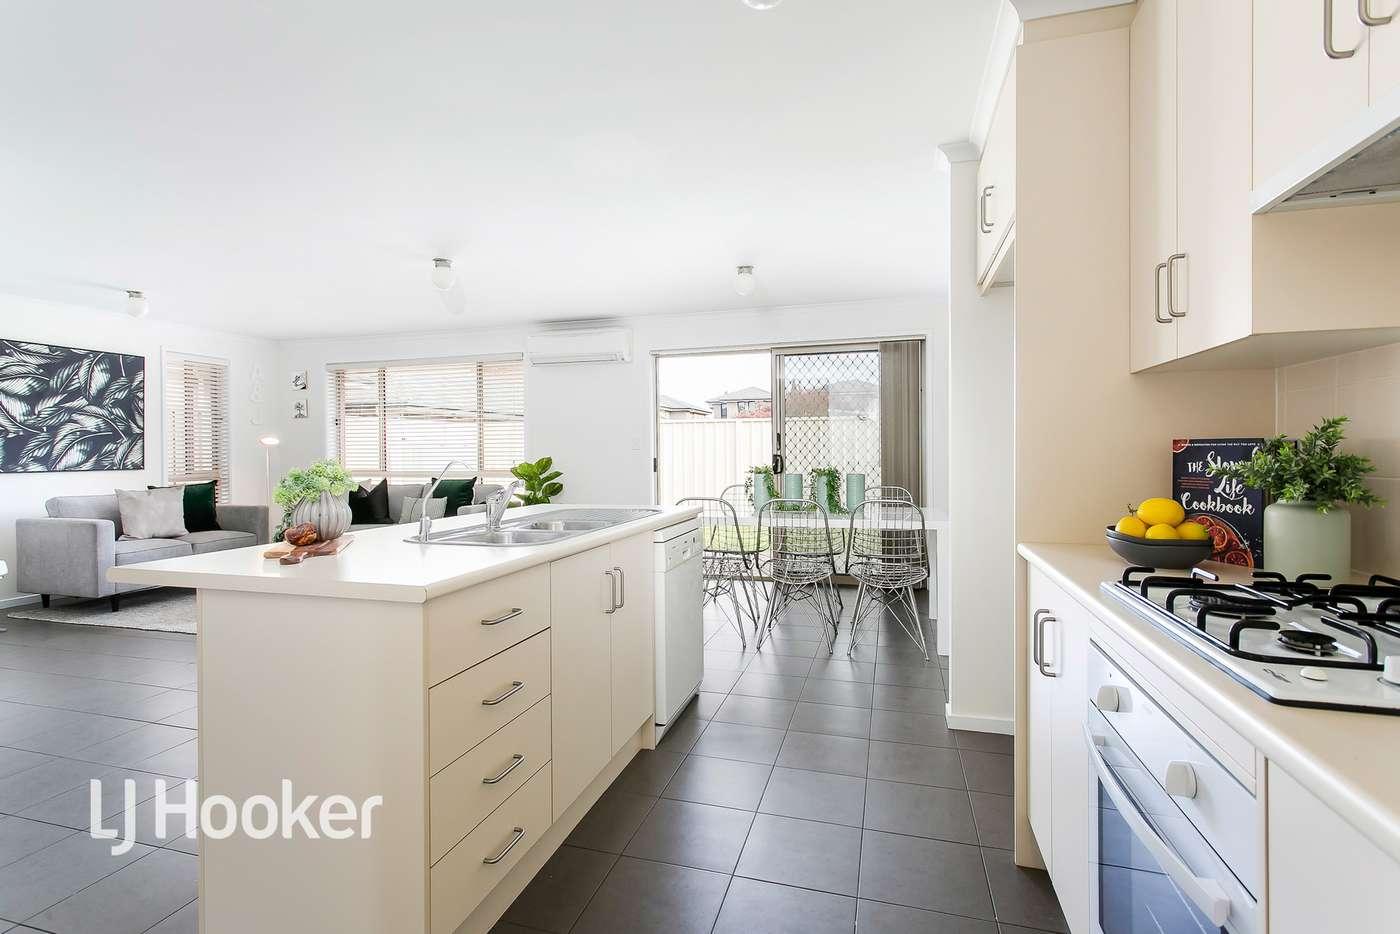 Sixth view of Homely house listing, 54 William Langman Circuit, Ridleyton SA 5008